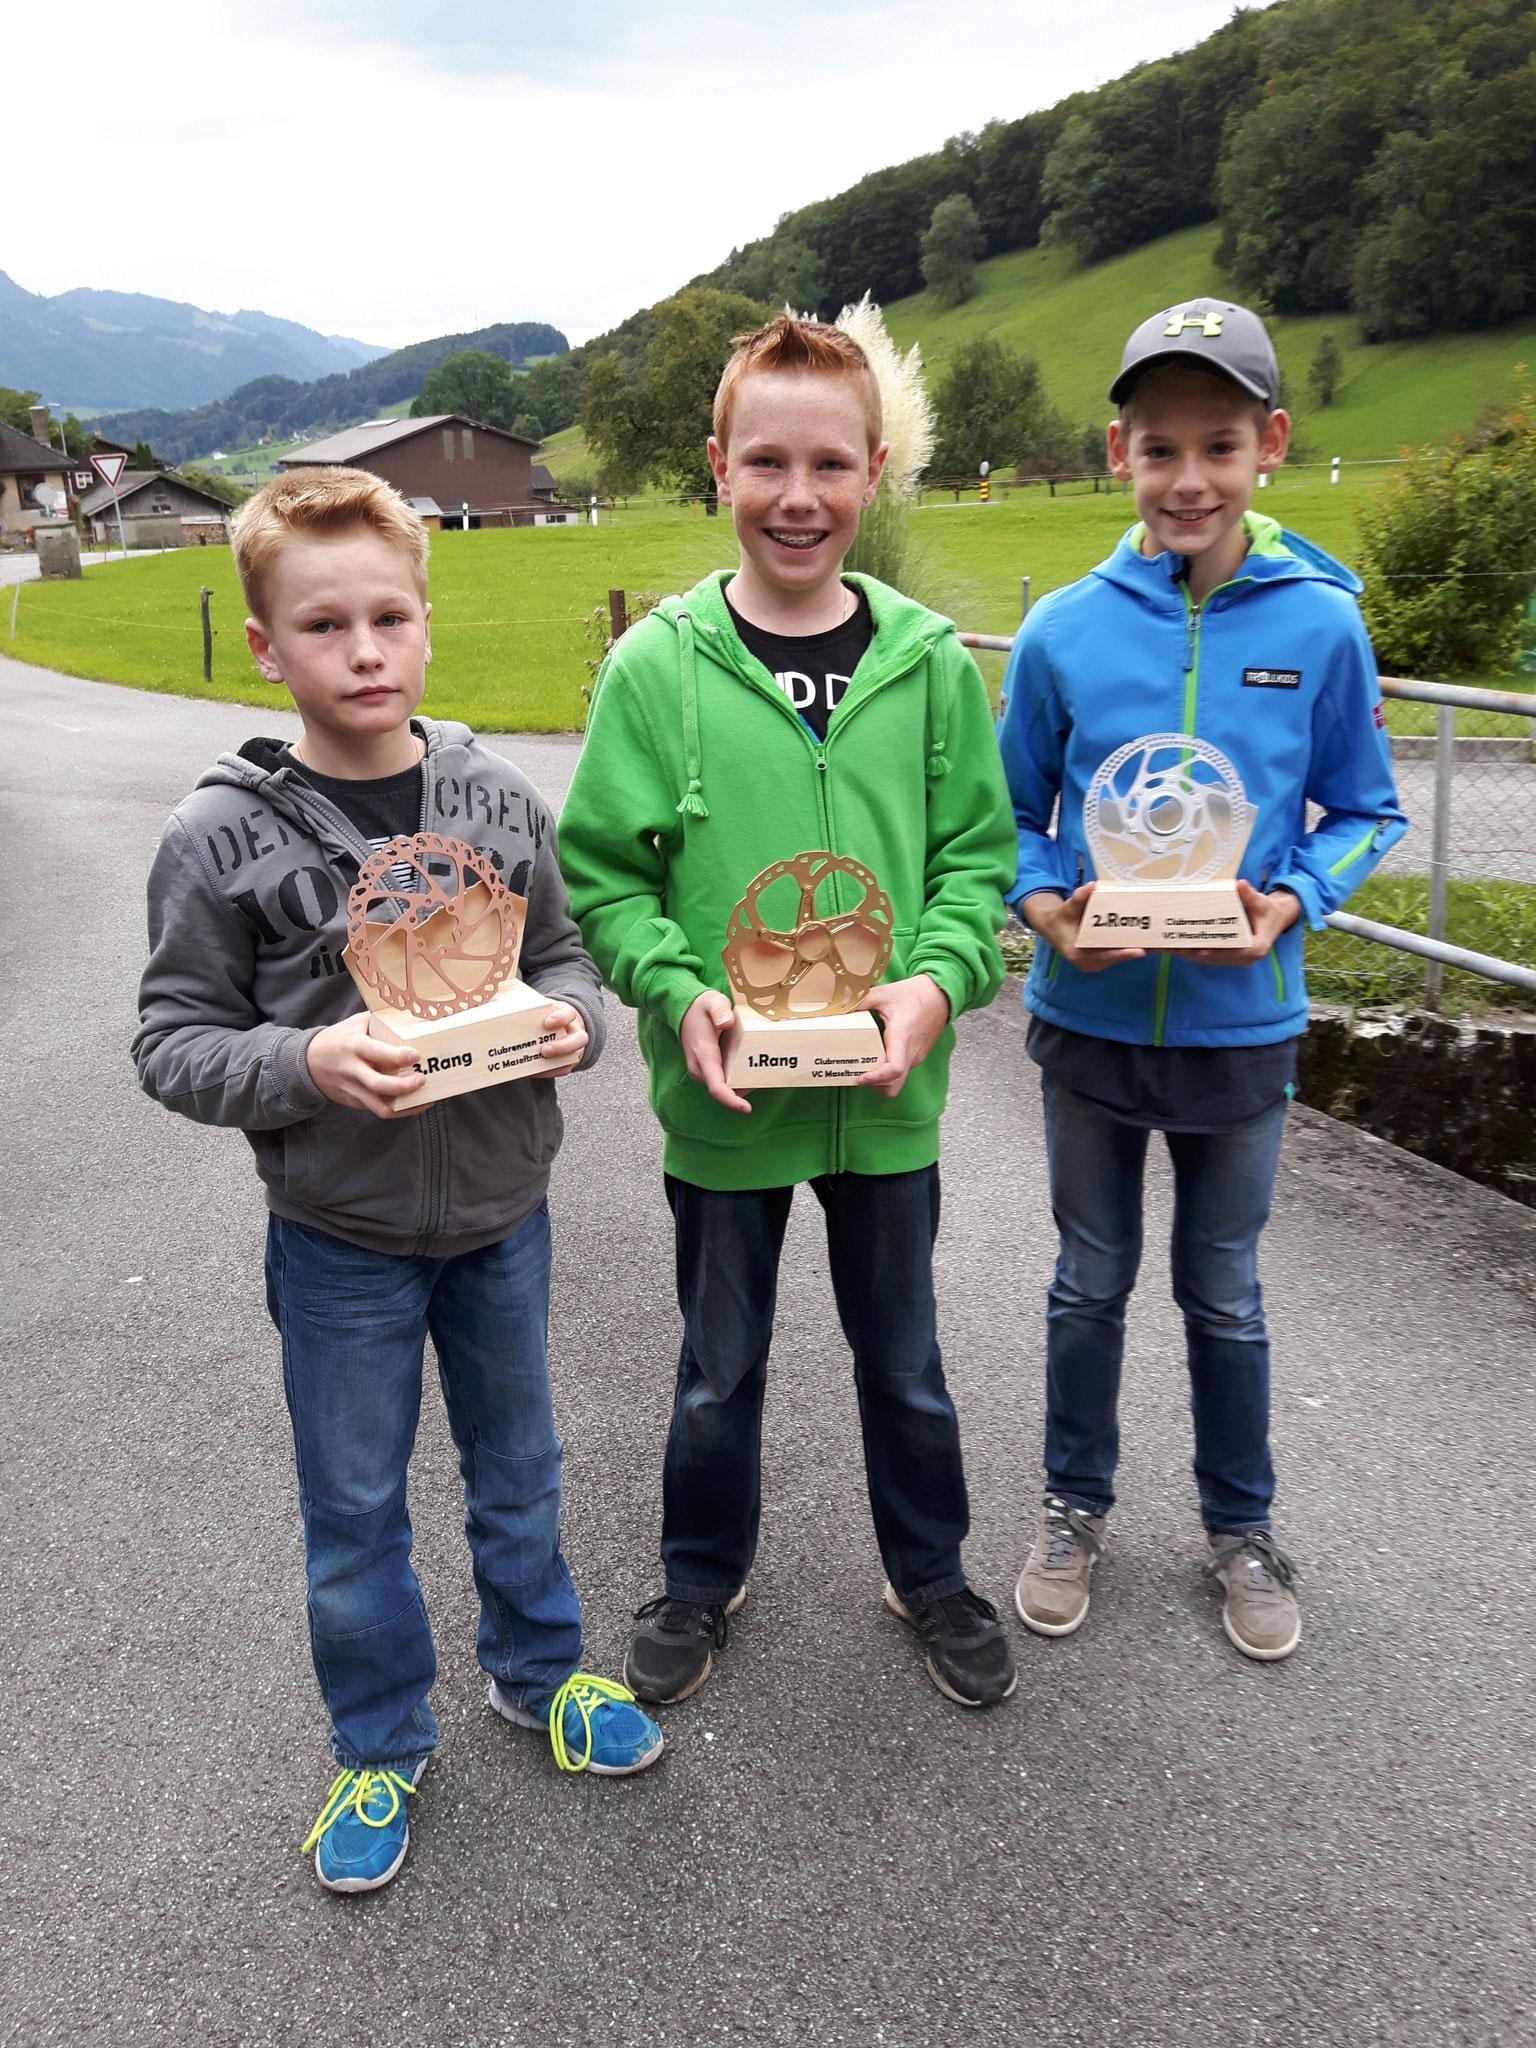 Club Nachwuchs Knaben: 1.Rang Florian Egli  2.Rang Joel Zahner  3.Rang Simon Egli